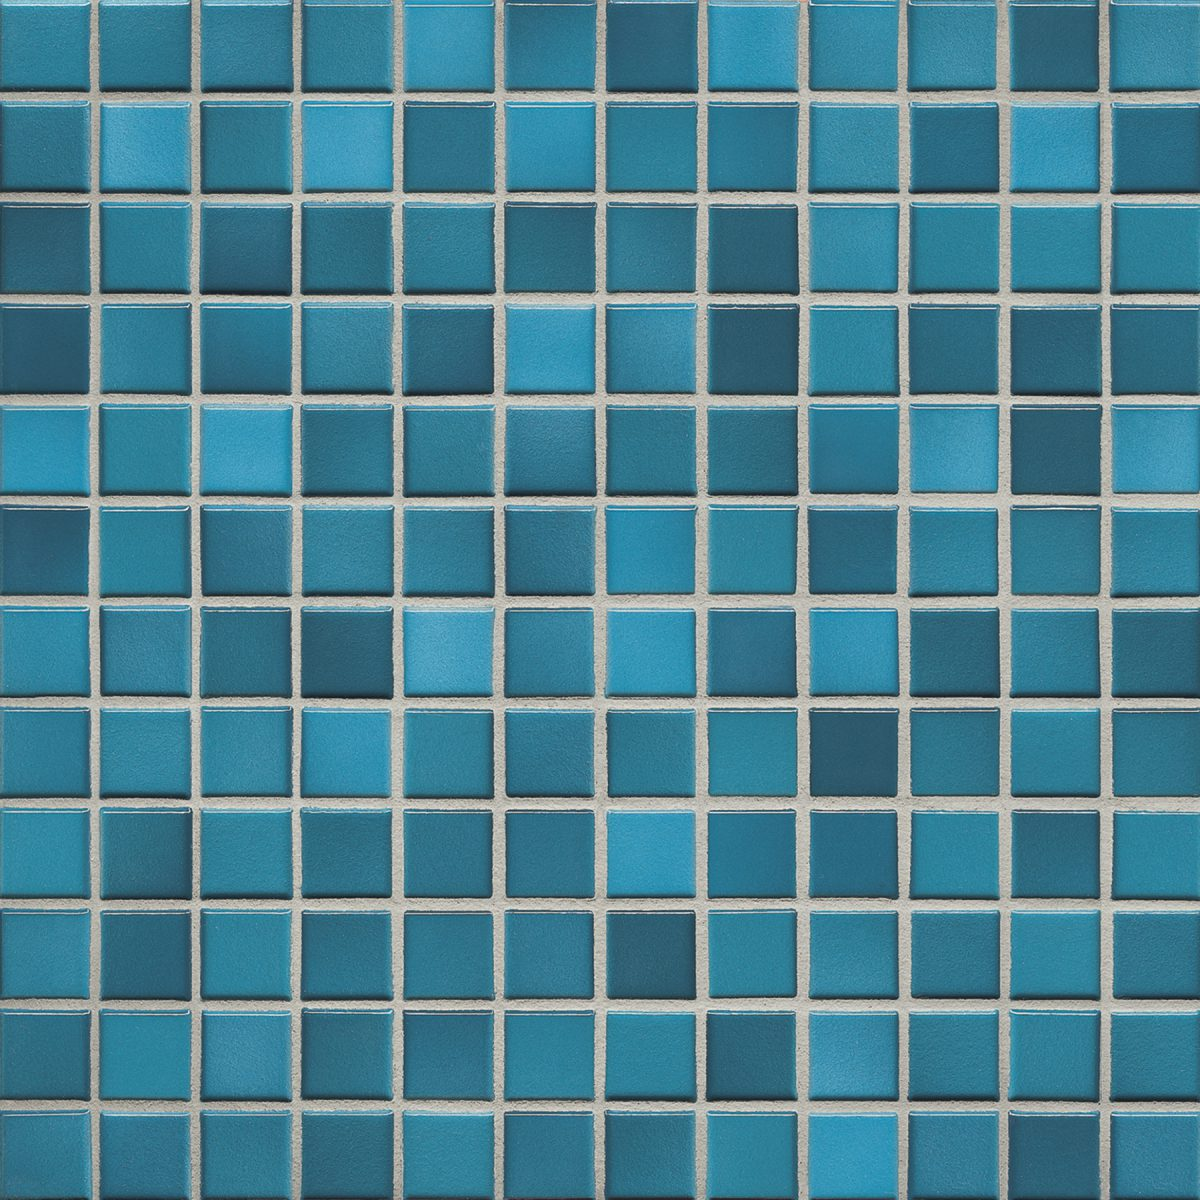 Мозаика серия Fresh 2,4 X 2,4 см Pacific Blue Mix Glossy (глазурованная)